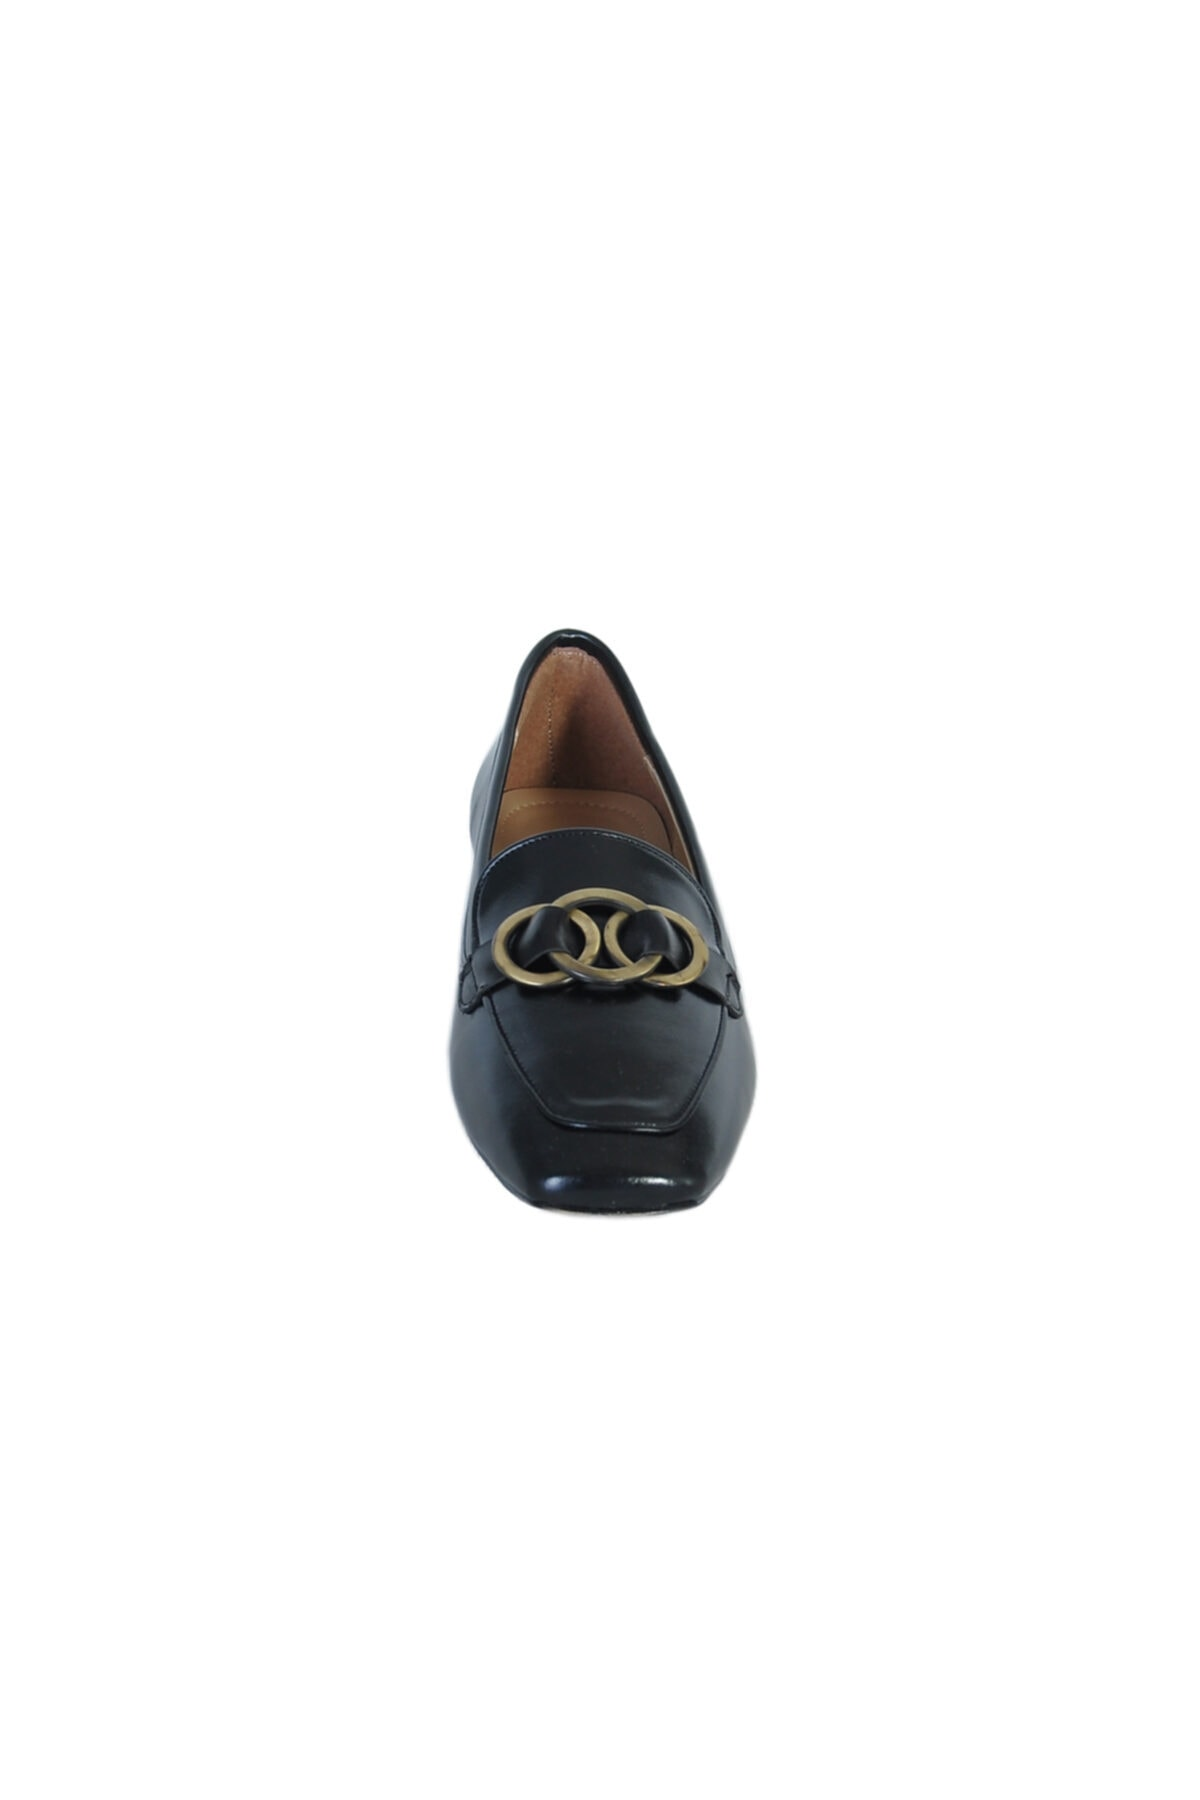 KEMAL TANCA Kadın Siyah  Ayakkabı 1